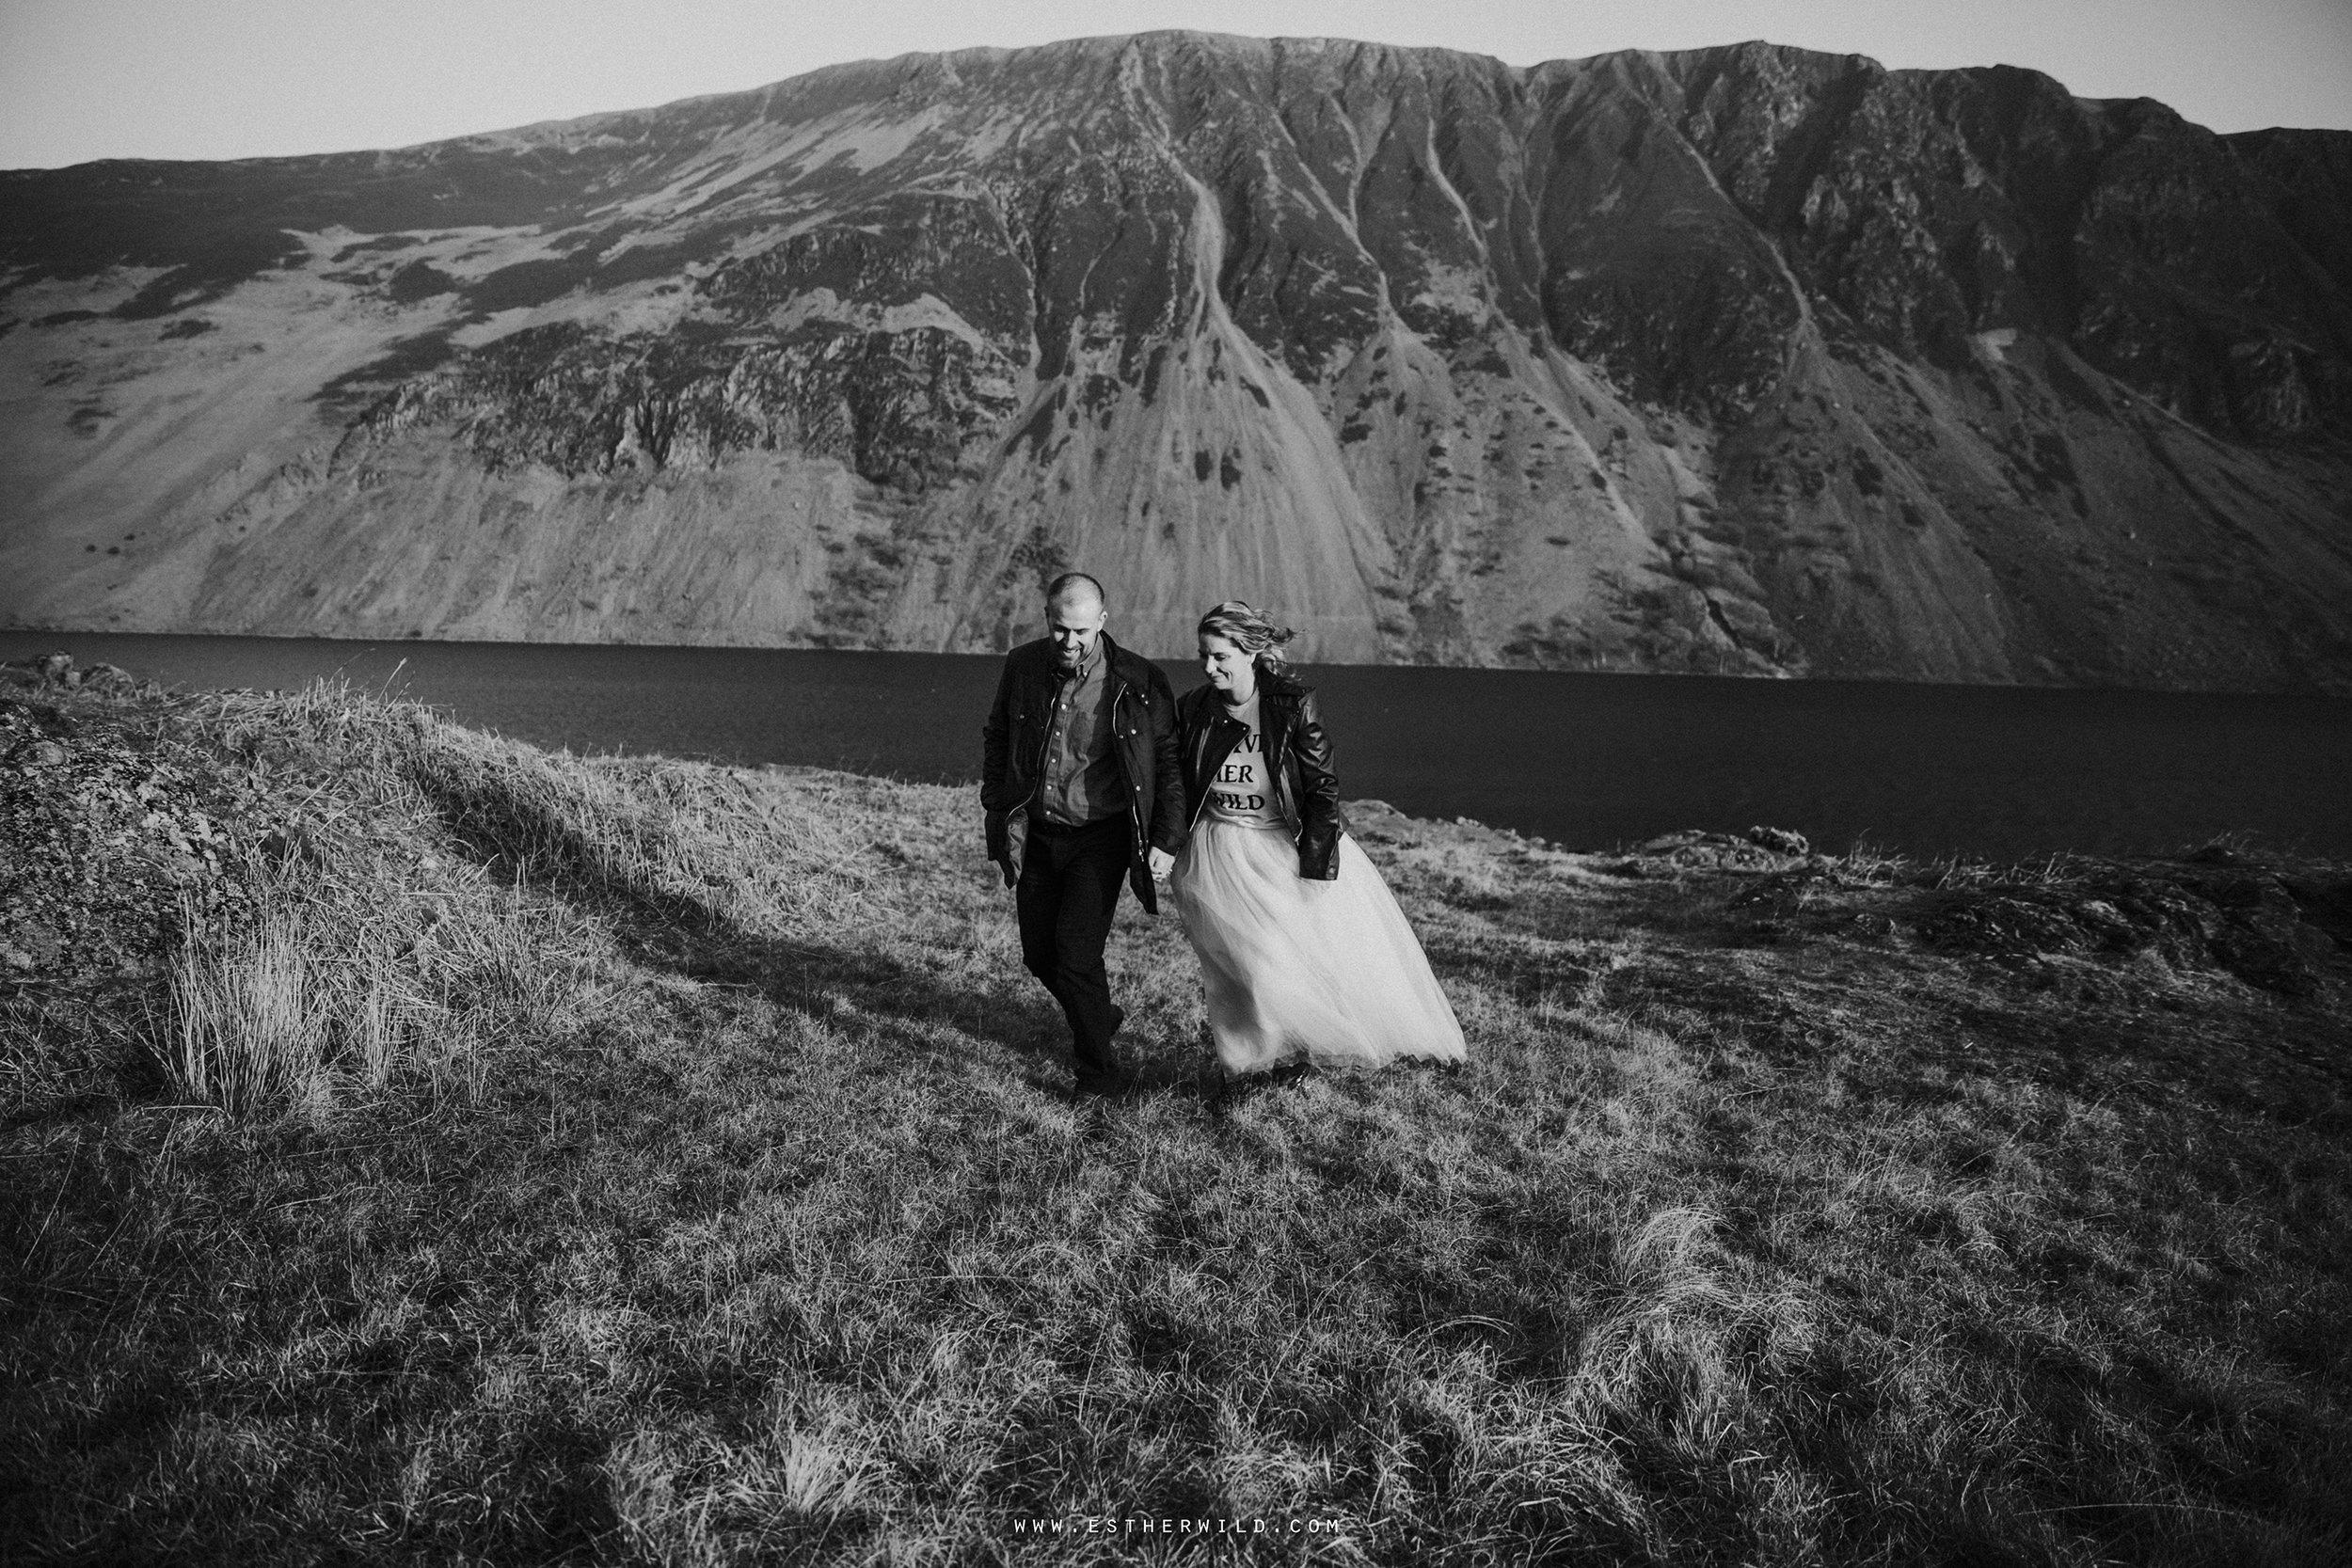 Cumbria_Lake_District_Wasdale_Wedding_Photographer_Destination_Engagement_Anniversary_Esther_Wild_IMG_4566.jpg